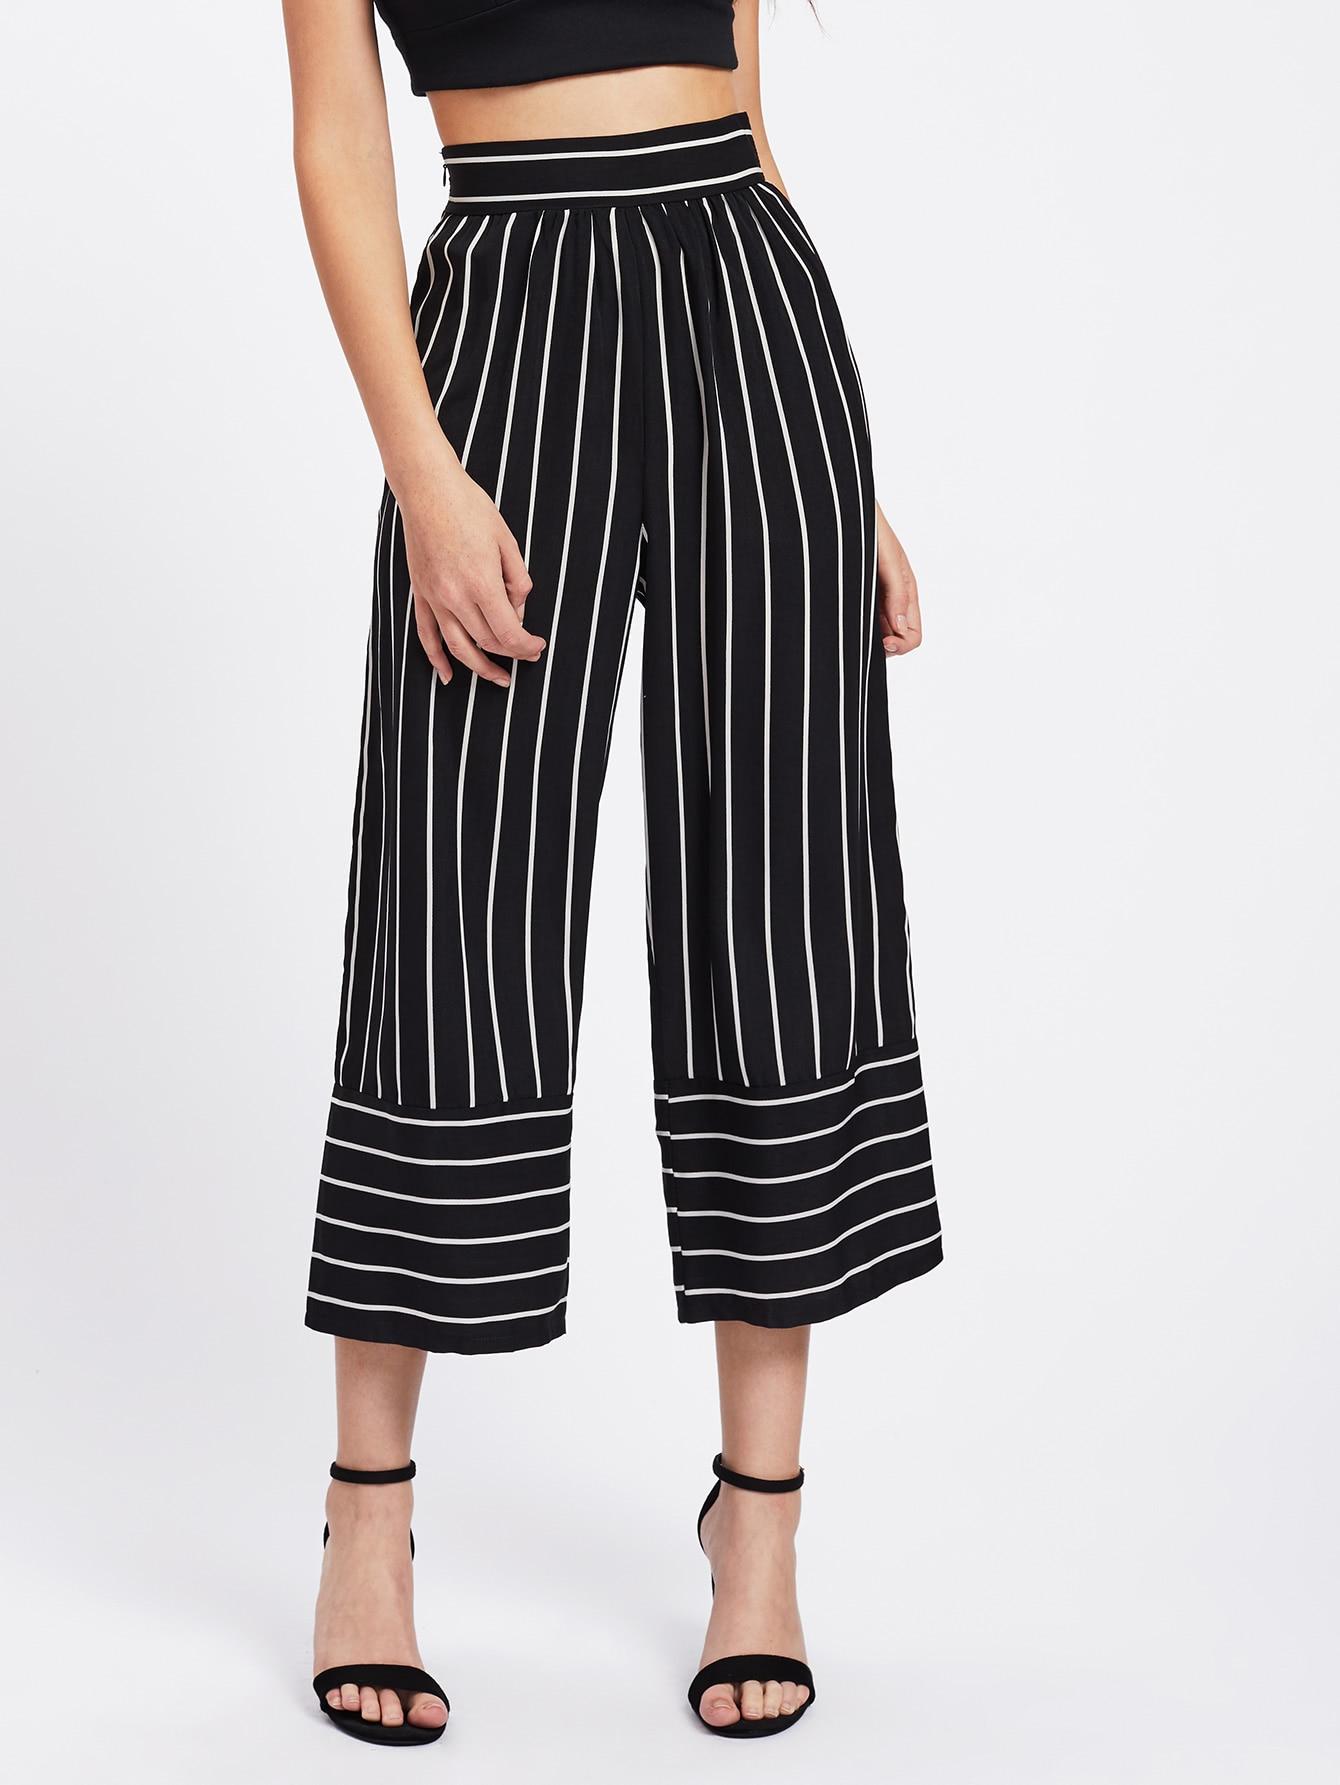 New Wide Leg Pants Women Stripes Pant High Waist Loose